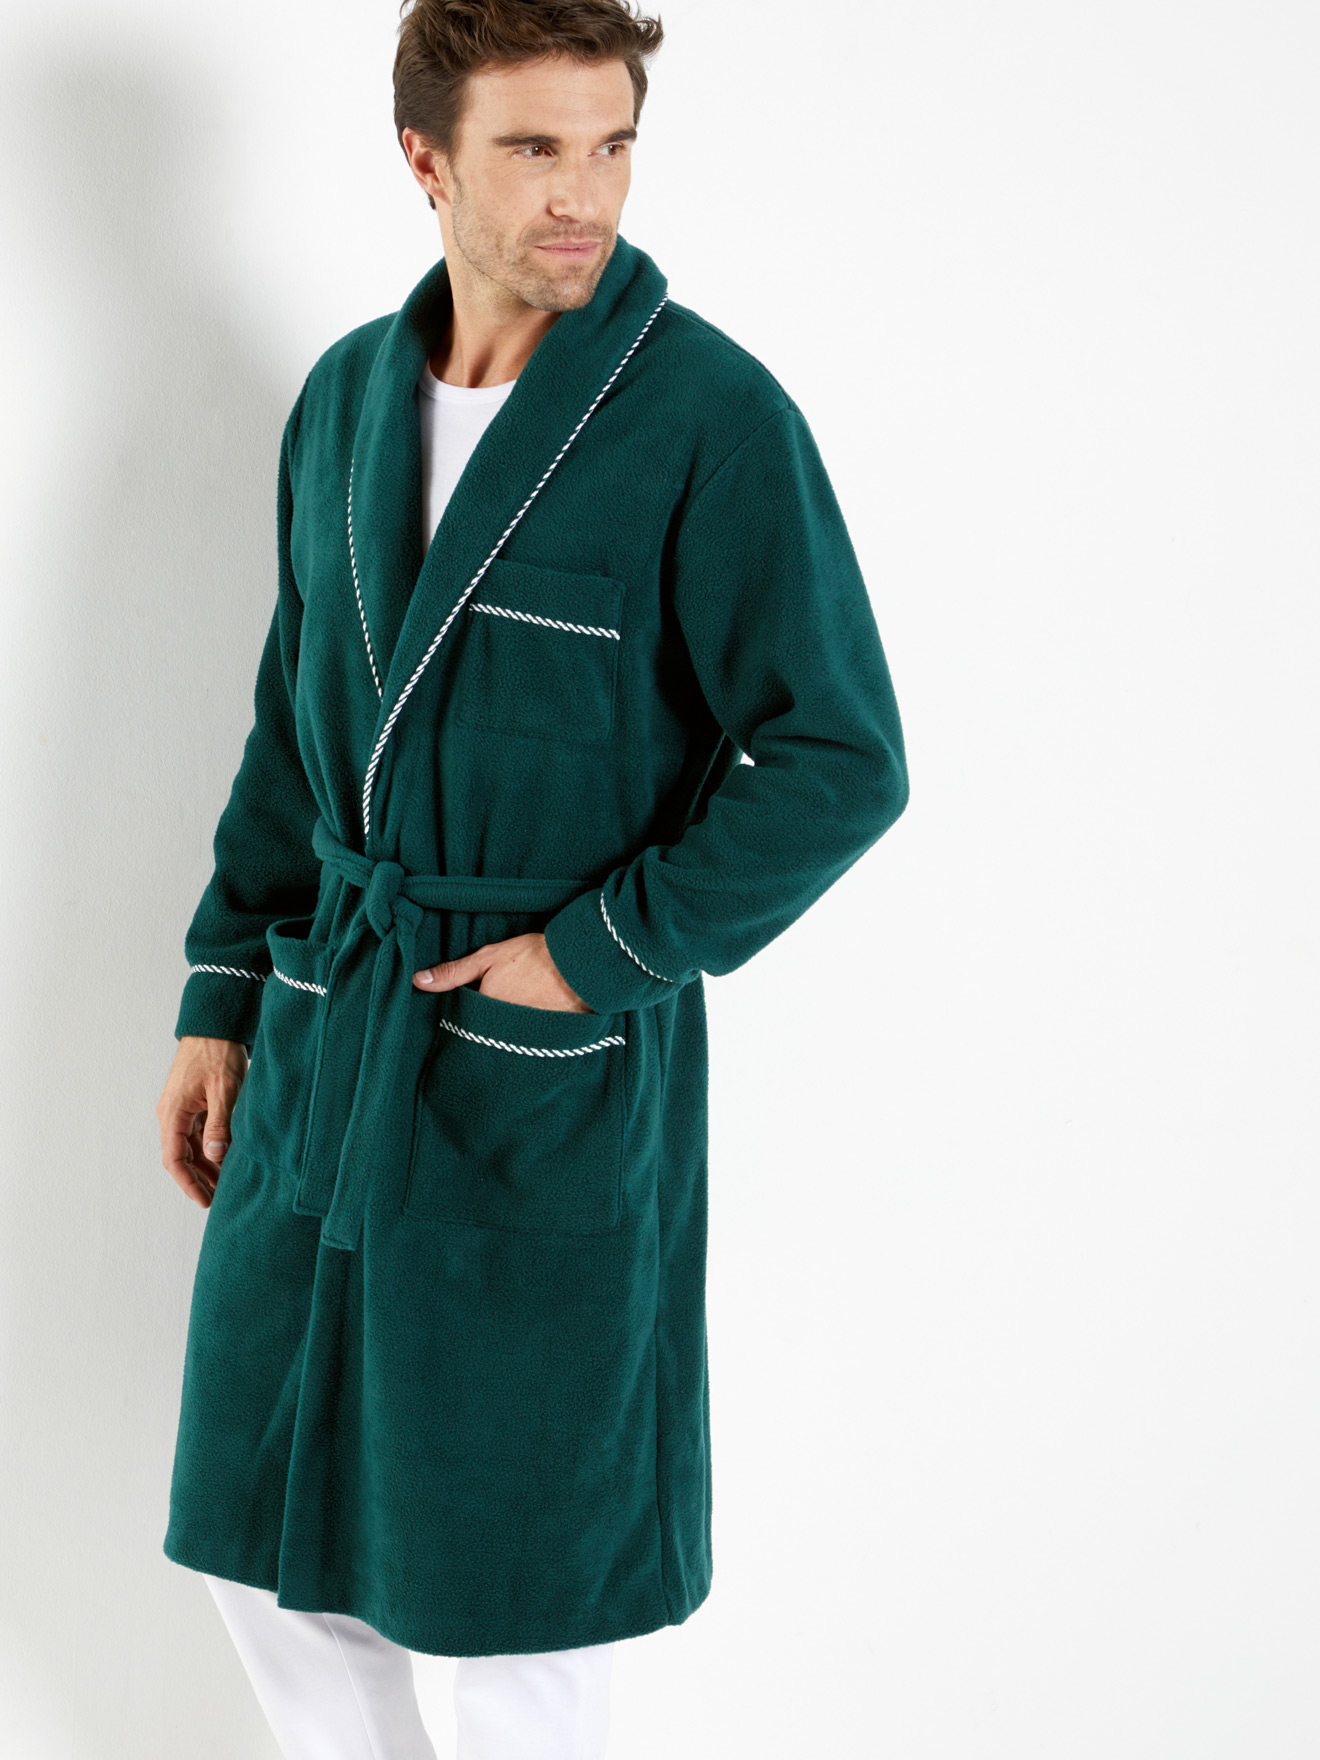 Robe De Daxon Chambre Maille Polaire rrd0wq